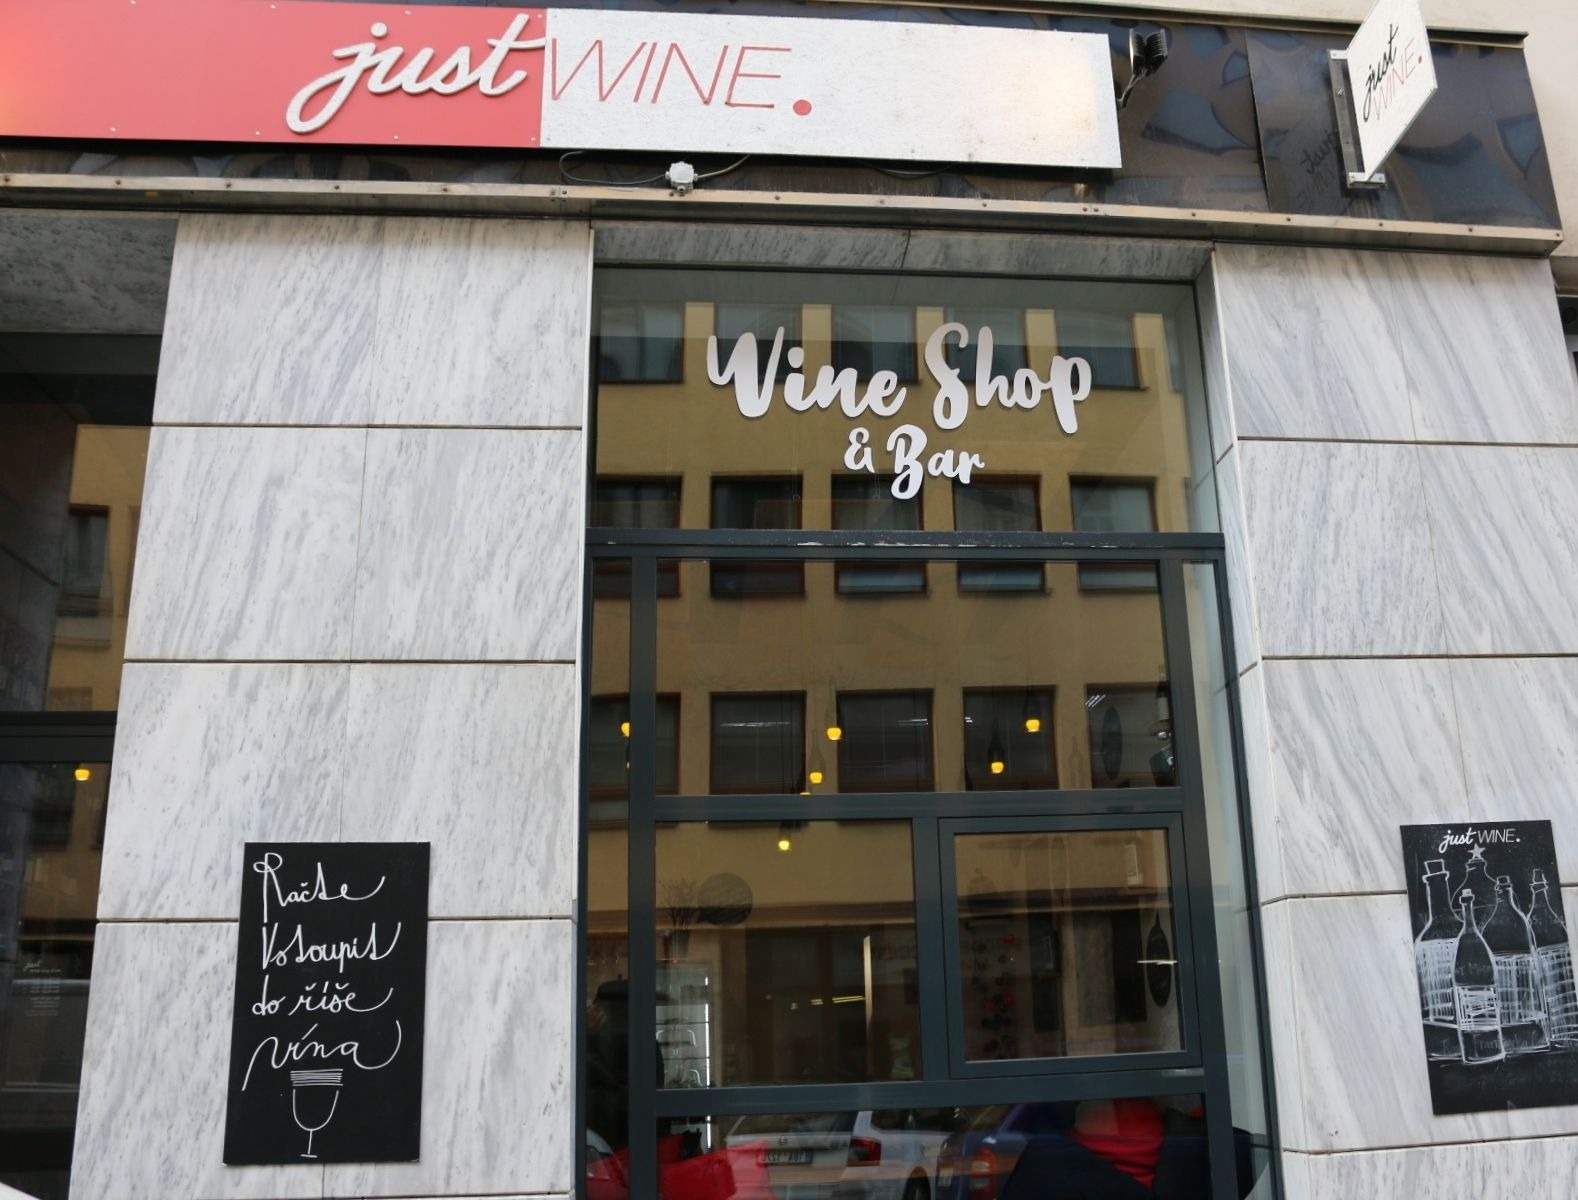 jw-facade-1.jpg